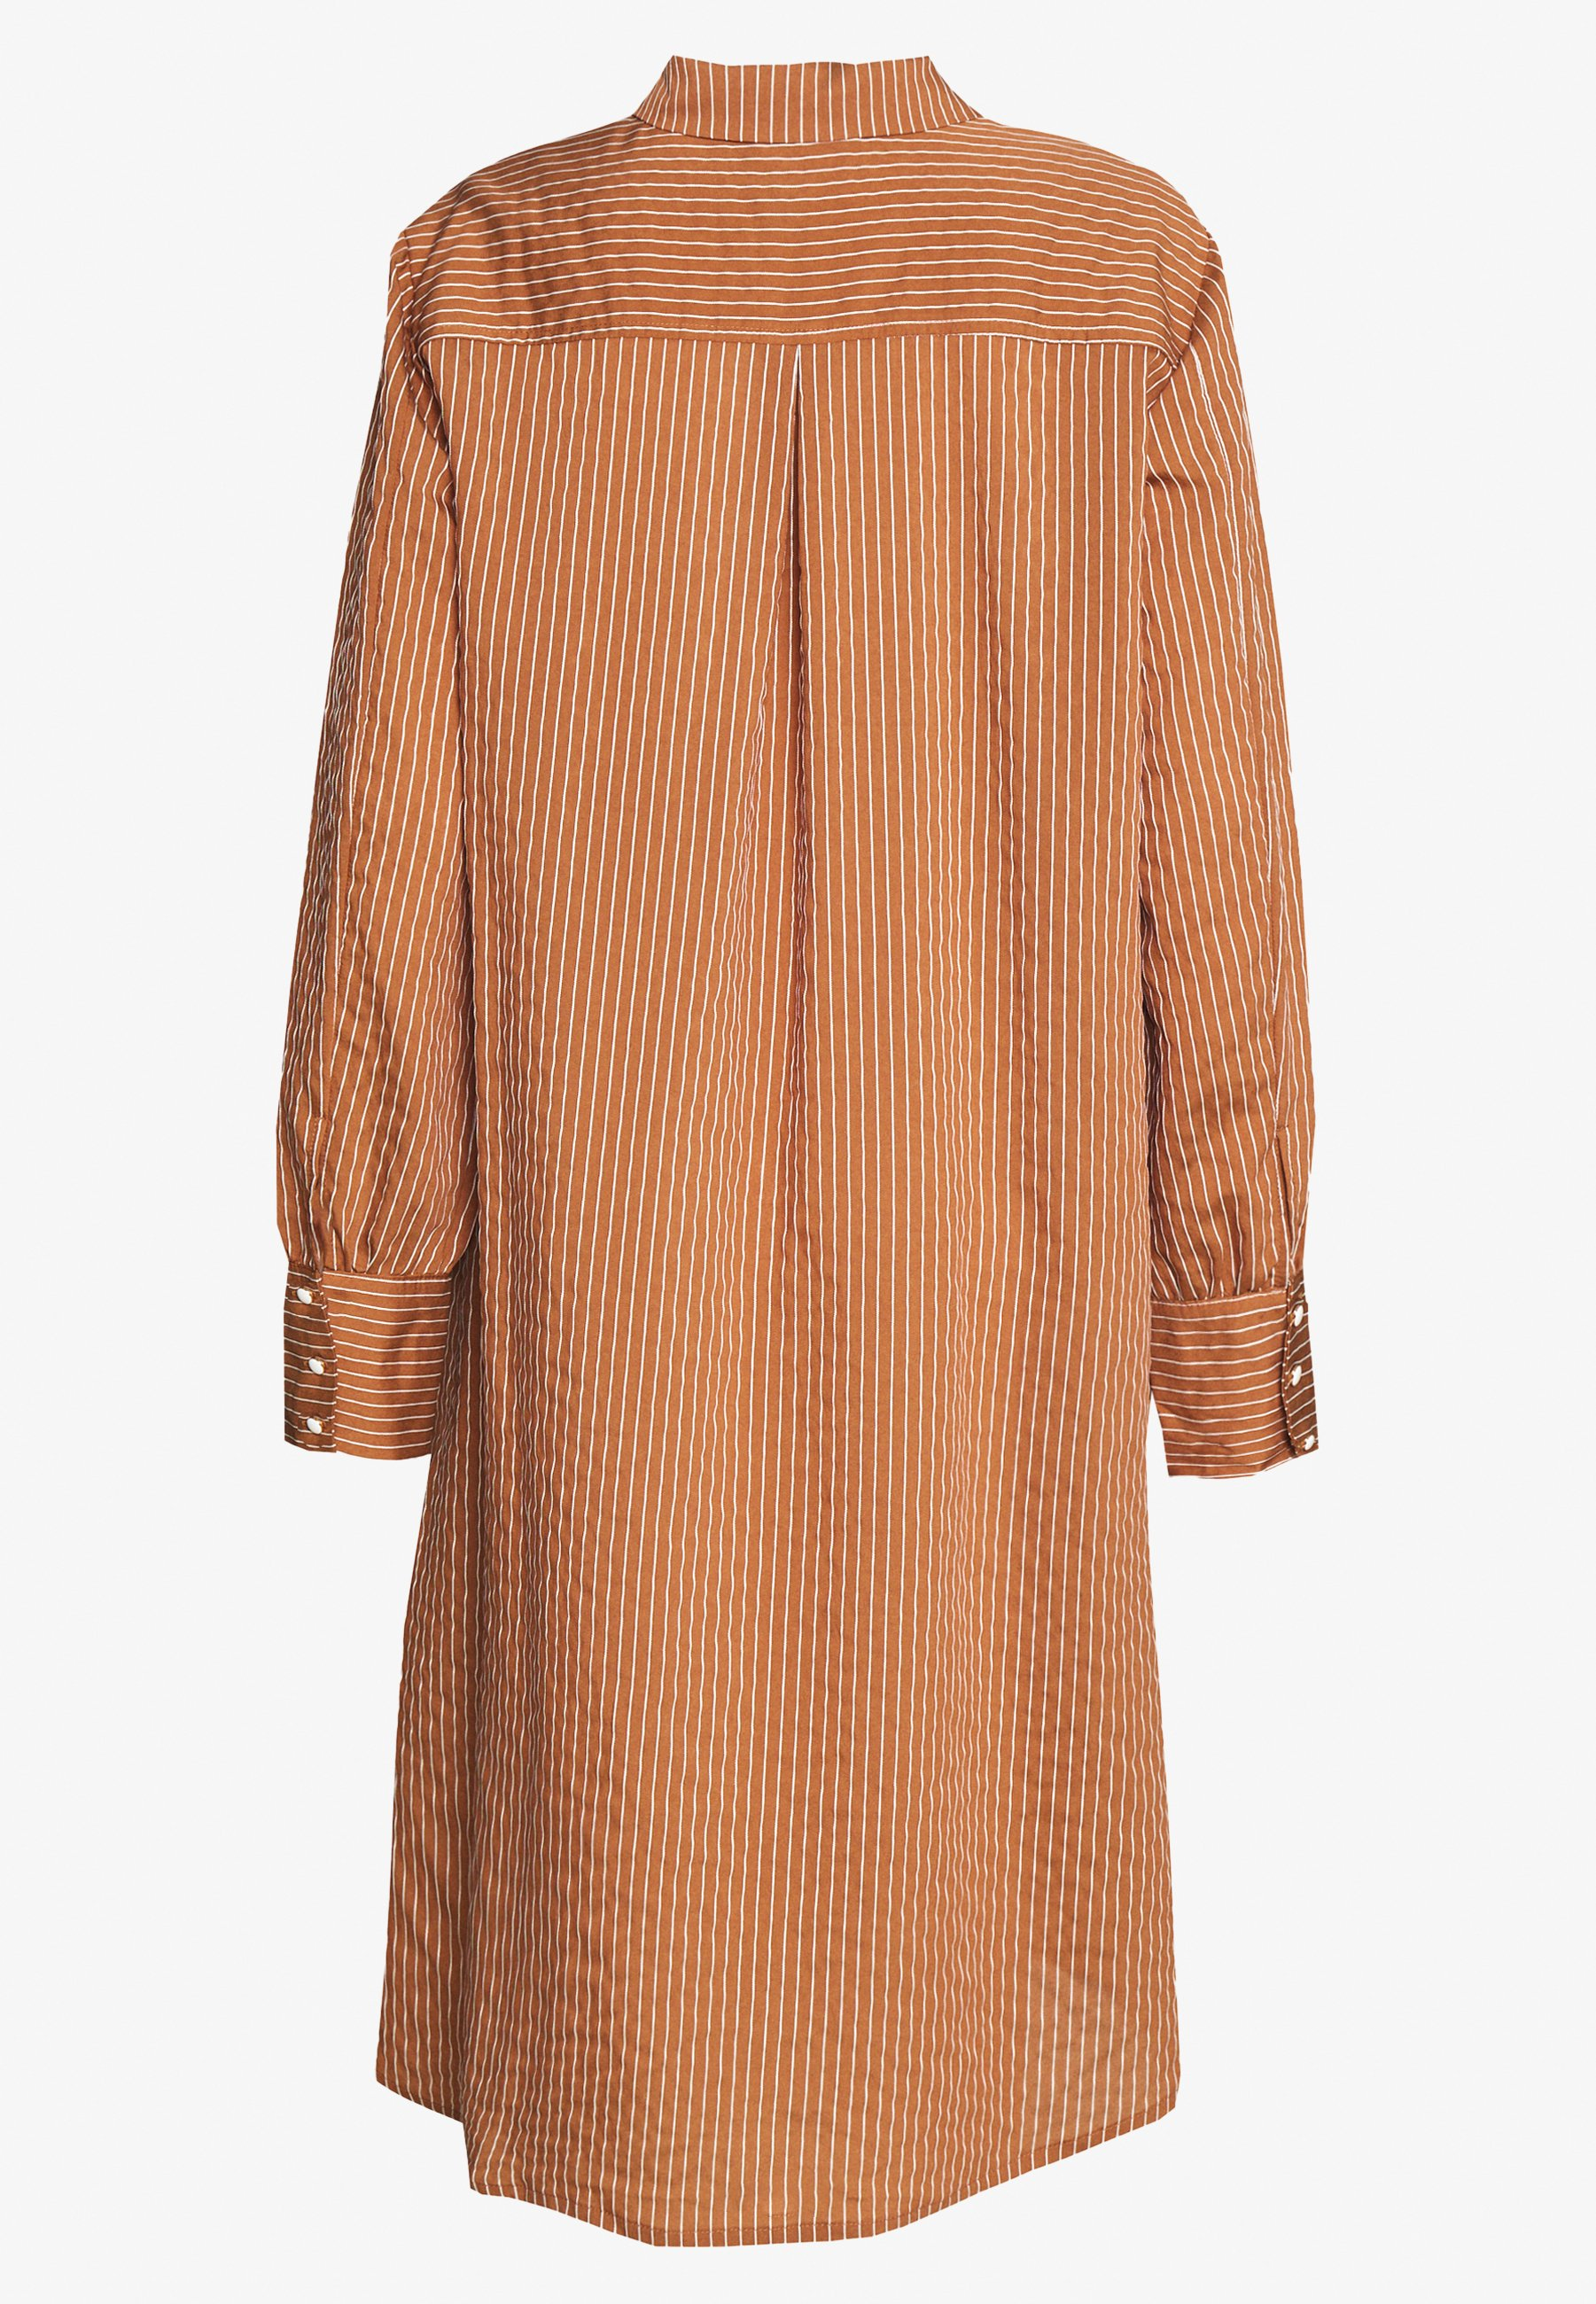 Culture Cunathleen Dress - Robe Chemise Lion/white 0wxTmvs